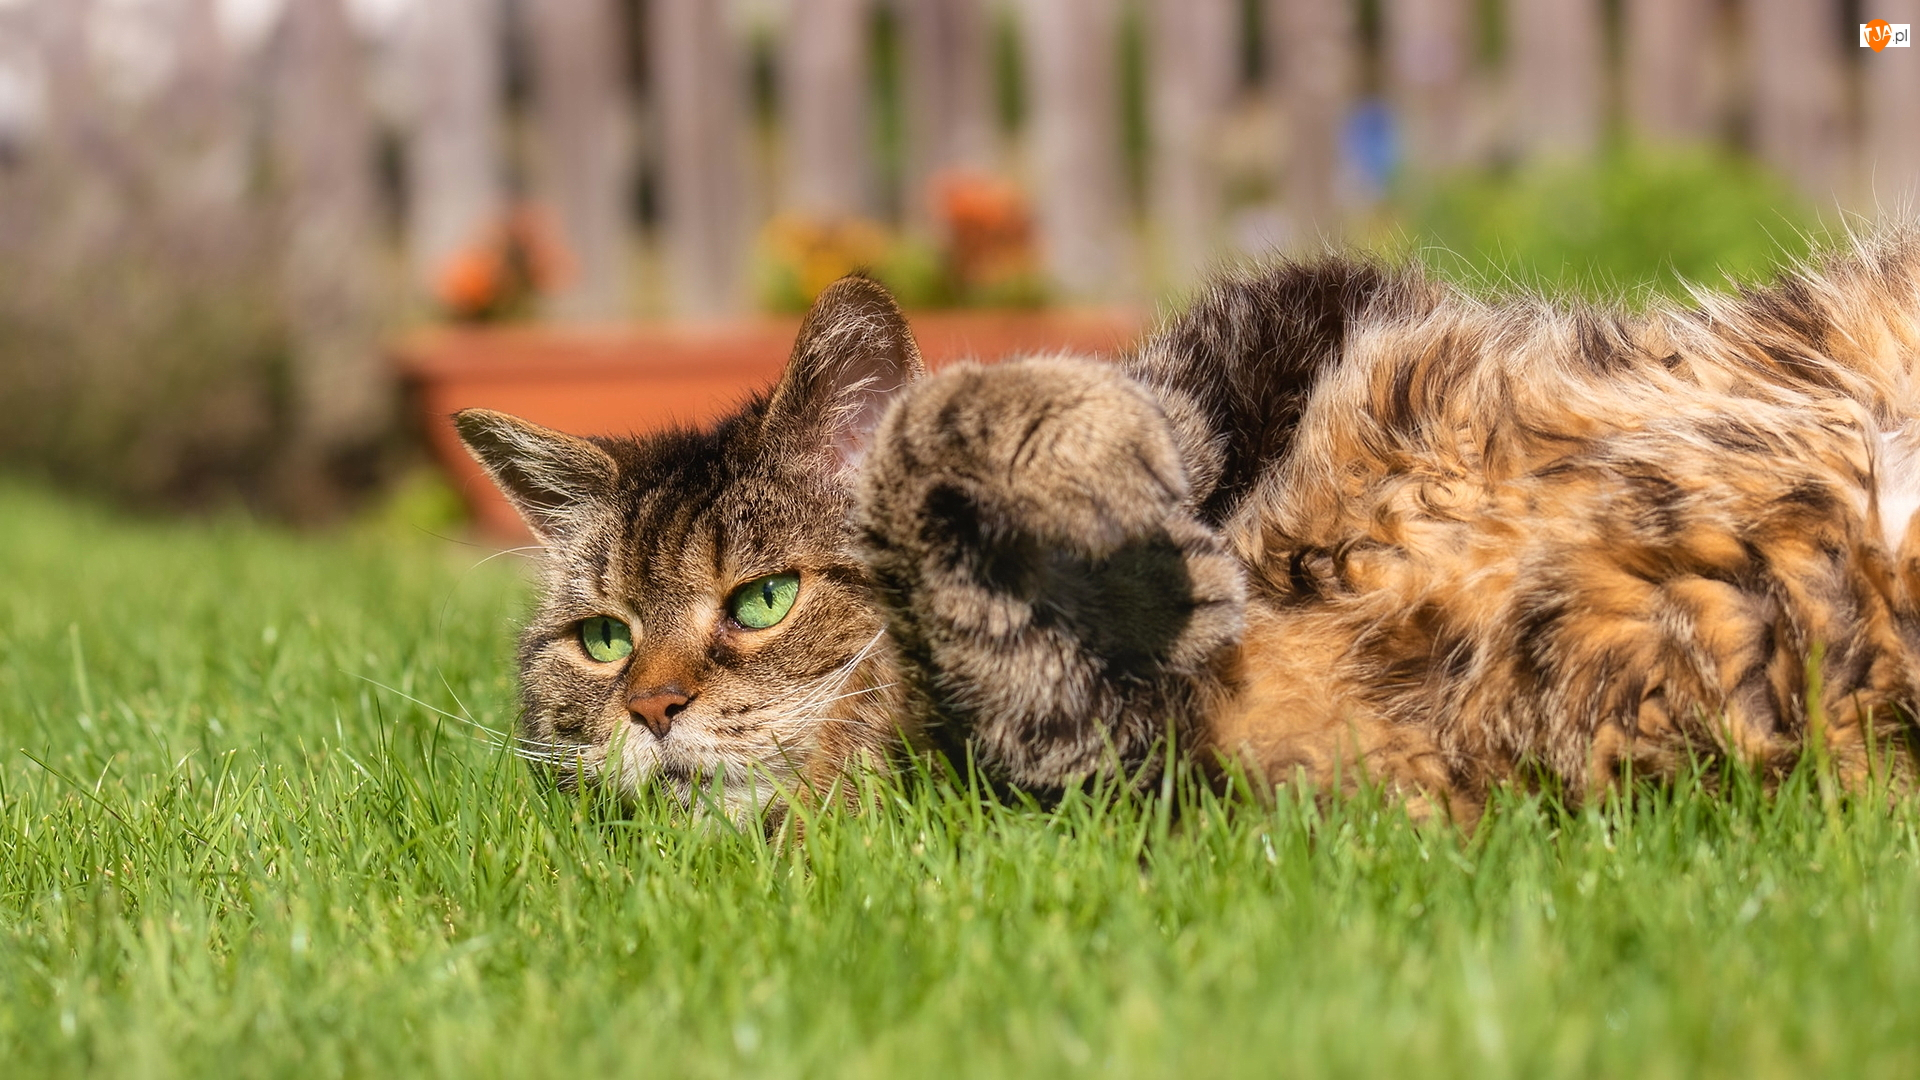 Kot, Leżący, Bury, Zielonooki